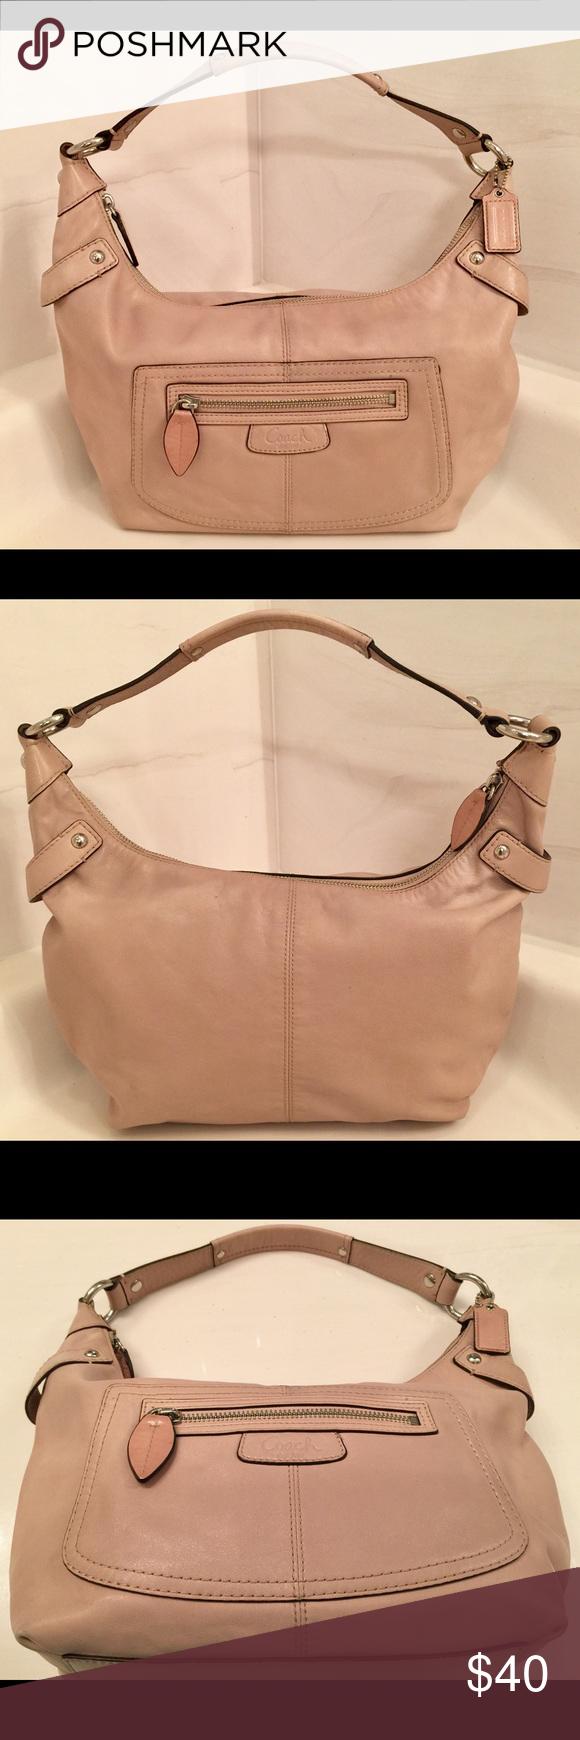 b8be6c9e2a ⚡️Coach women s purse  lady handbag  shoulder bag Coach women s handbag   shoulder purse